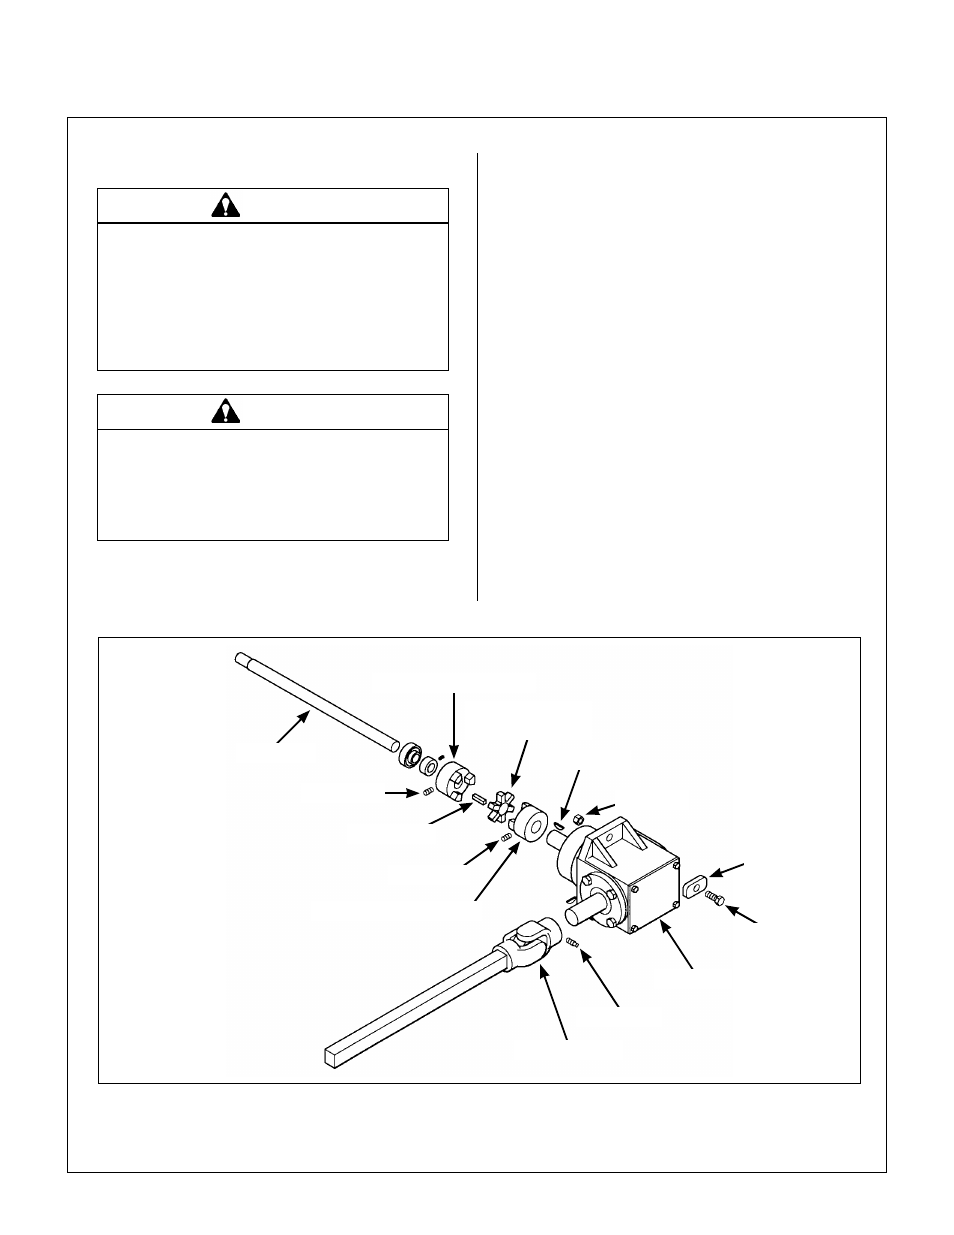 Replacing/repairing, Gearbox replacement, Replace gearbox | Walker